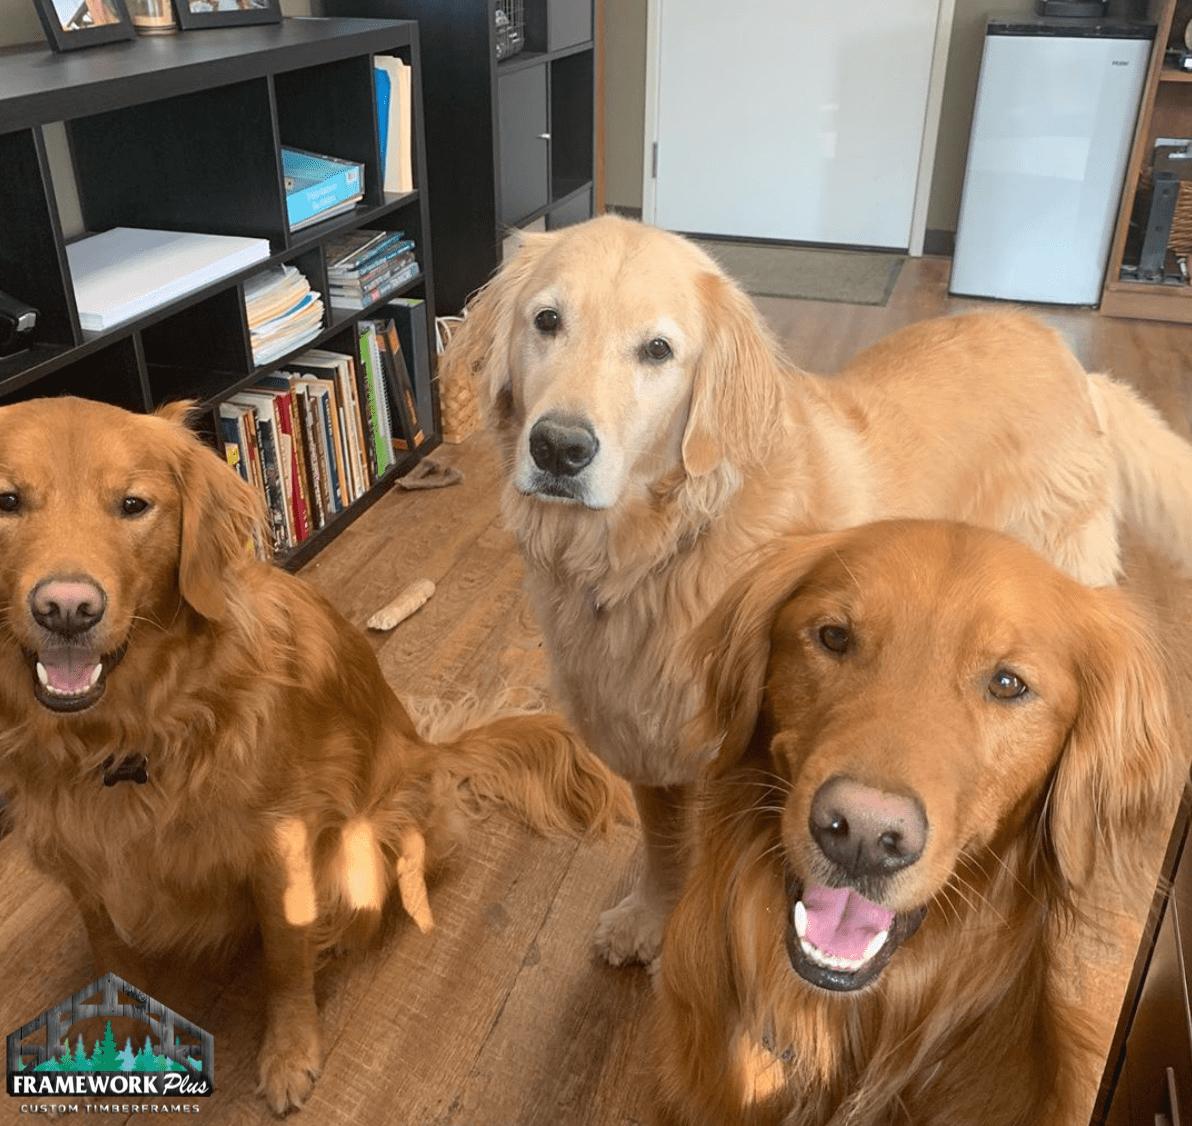 Frame Work Plus Pups